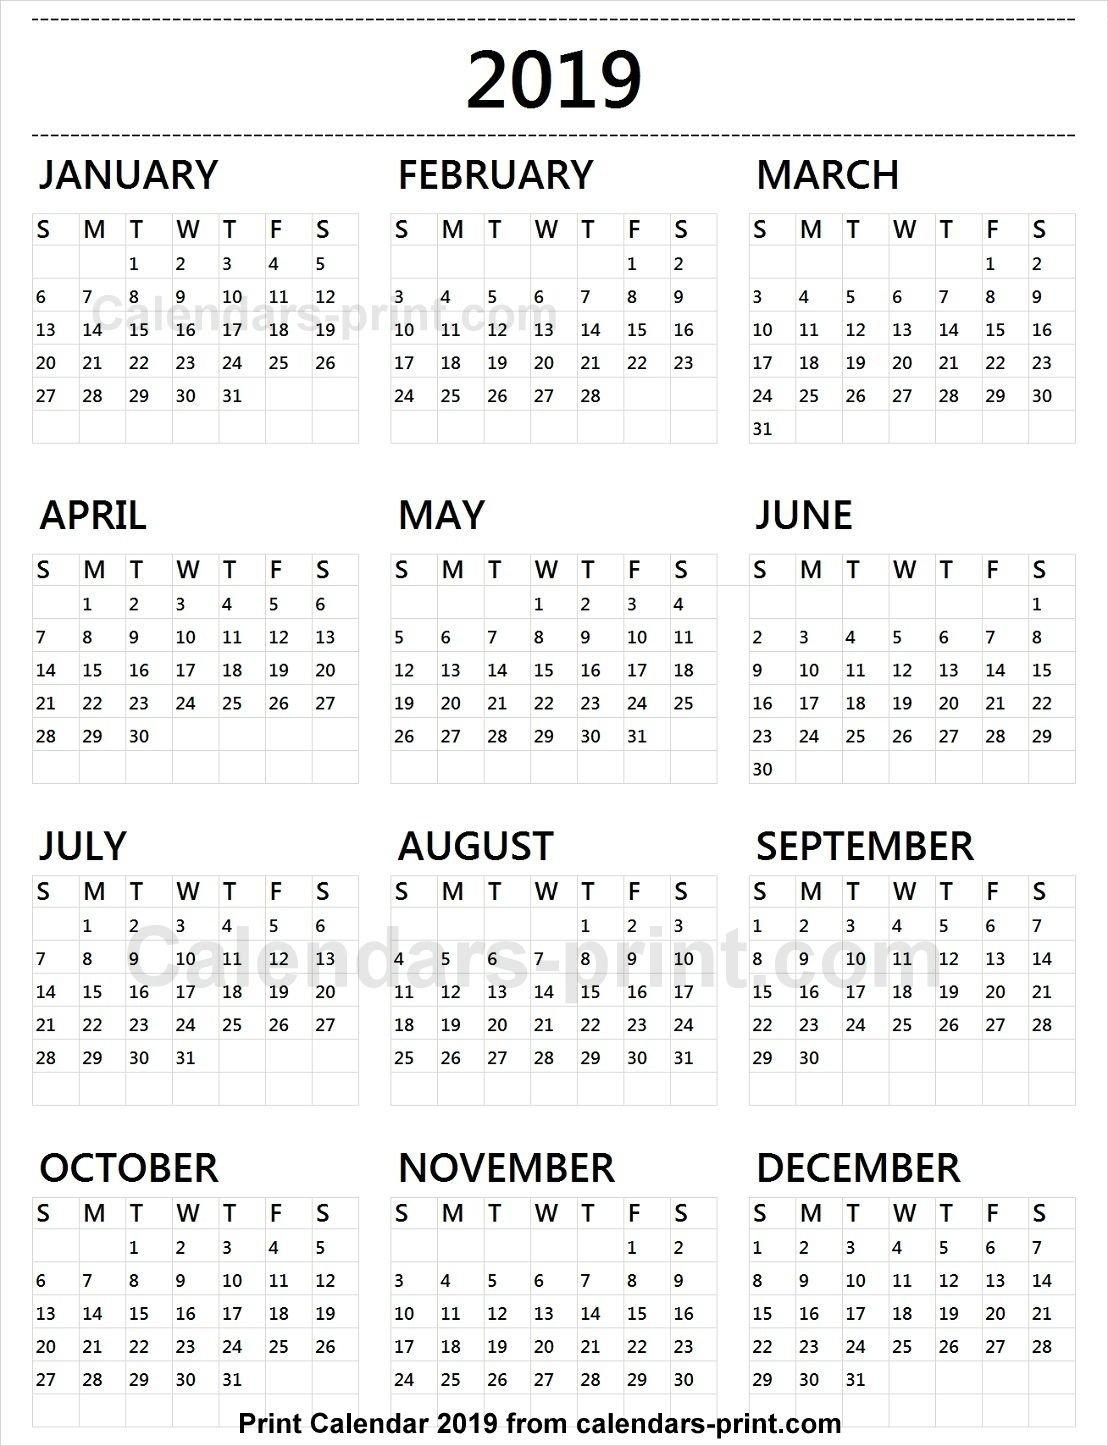 Calendar 2019 Tumblr | 2019 Yearly Calendar In 2019 | Calendar Calendar 2019 To Print